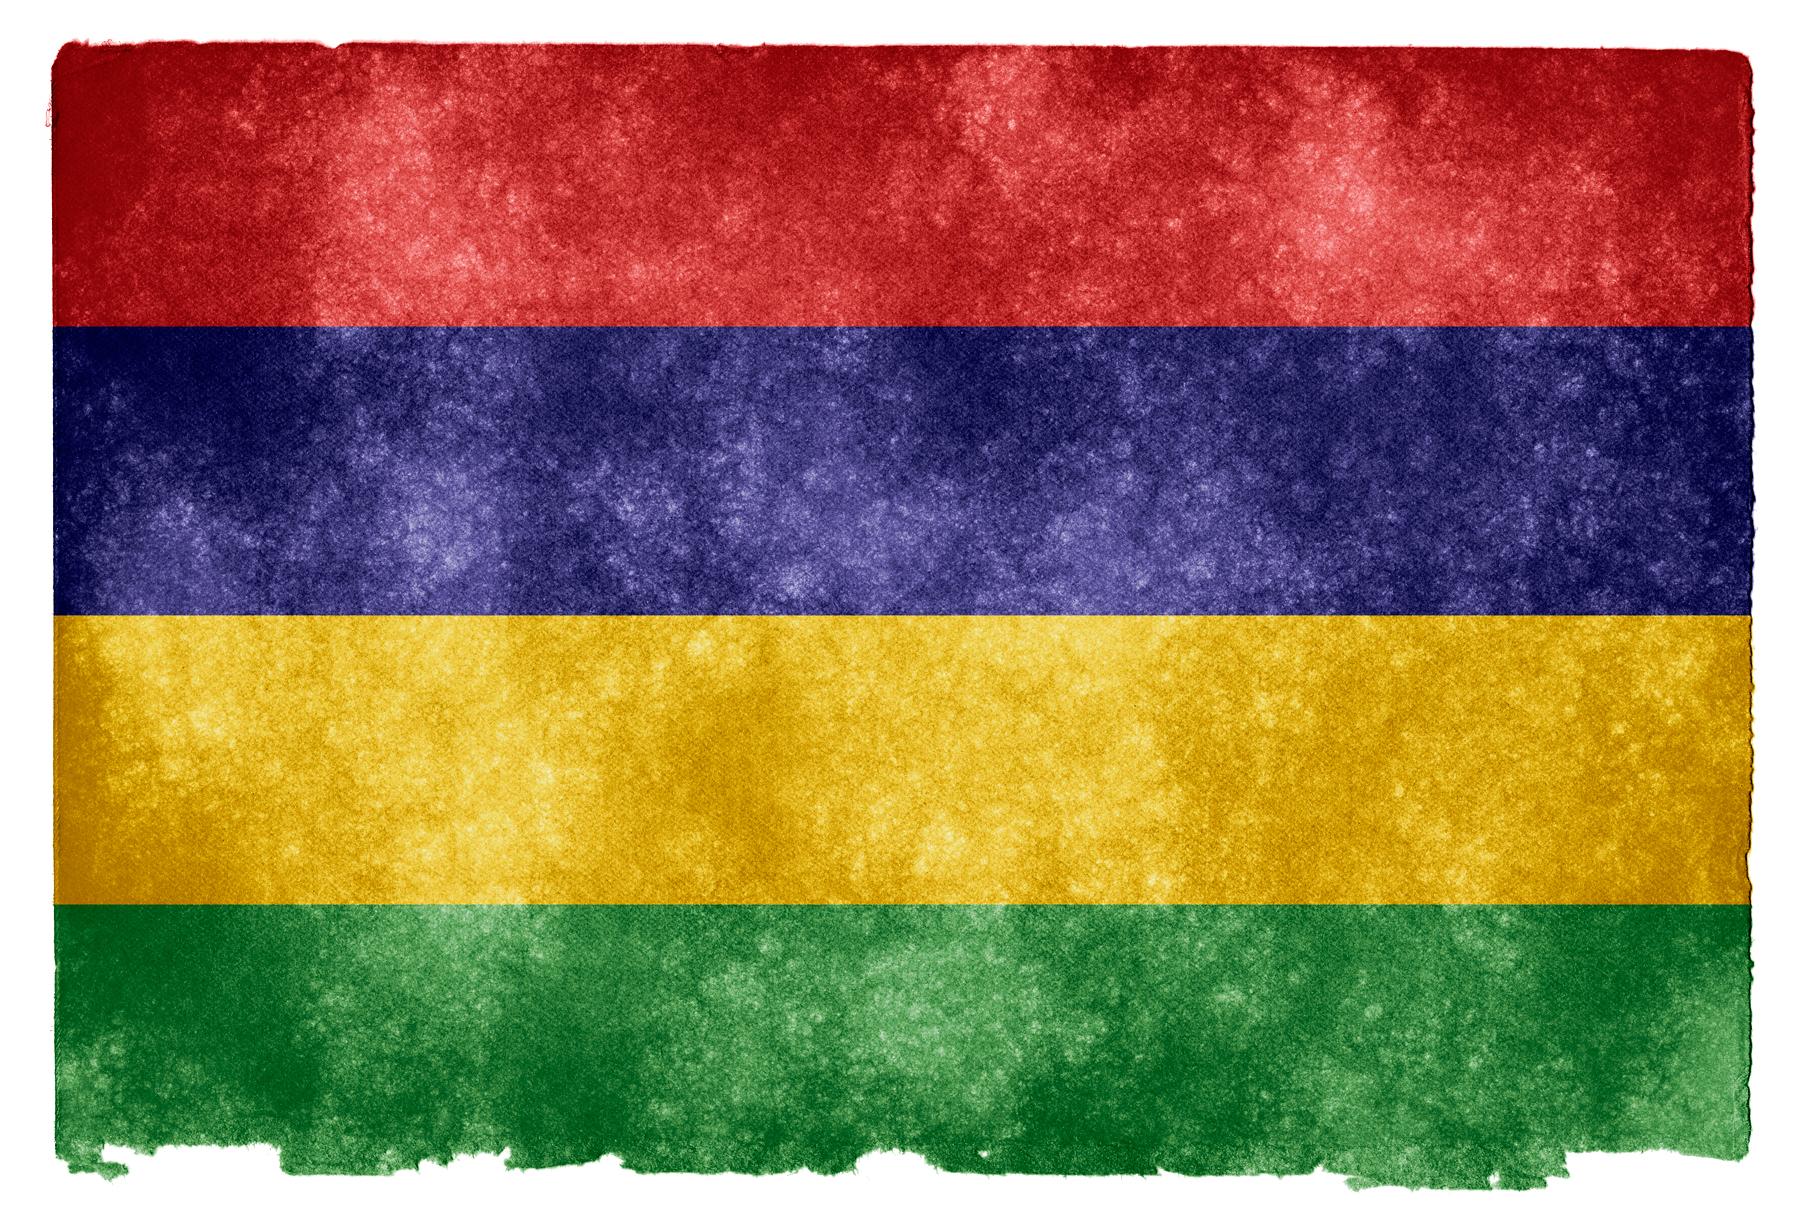 Mauritius Grunge Flag, Africa, Resource, Nation, National, HQ Photo